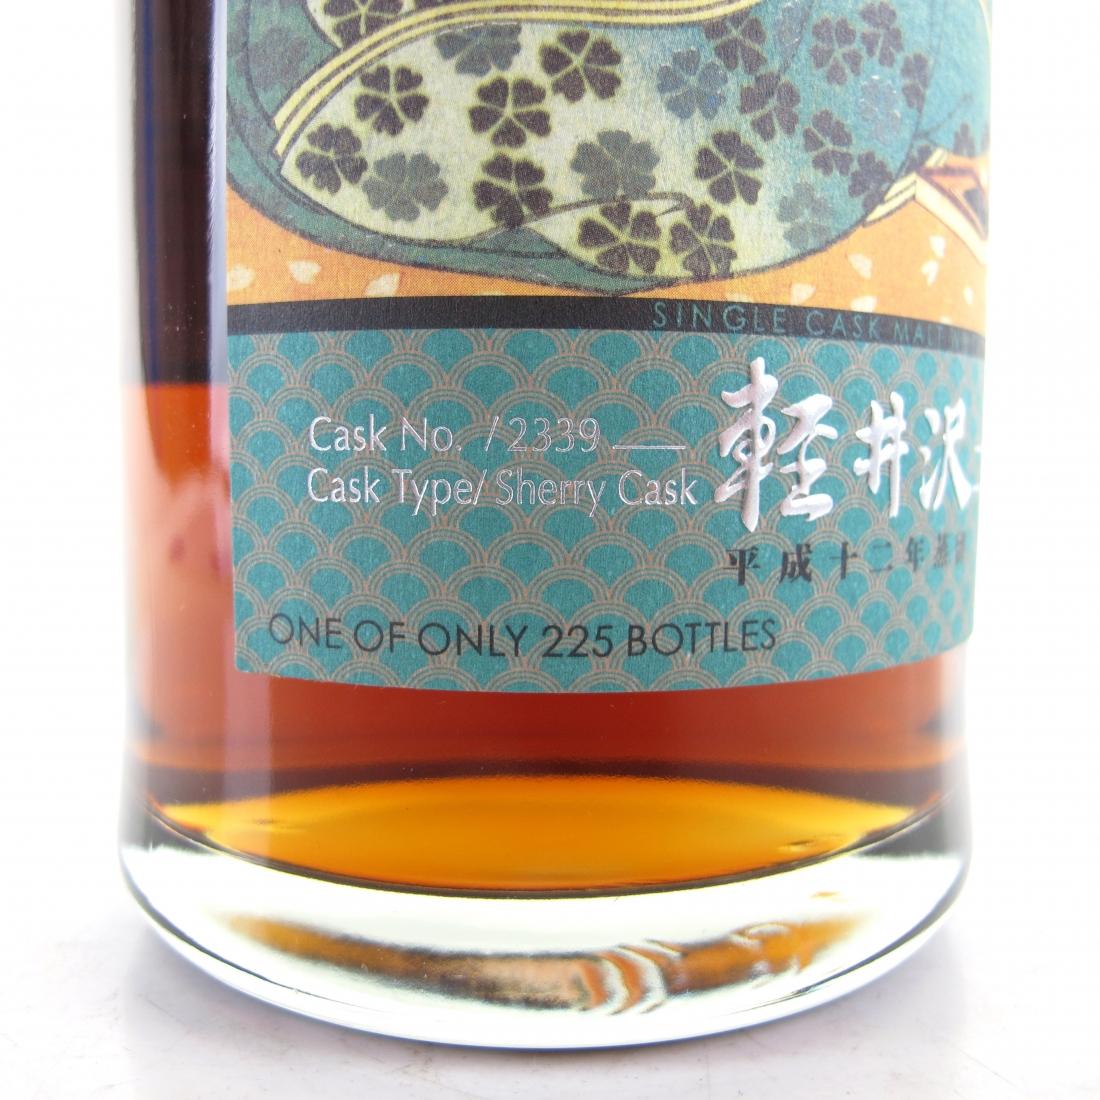 Karuizawa 2000 Single Cask #2339 / Geisha Label